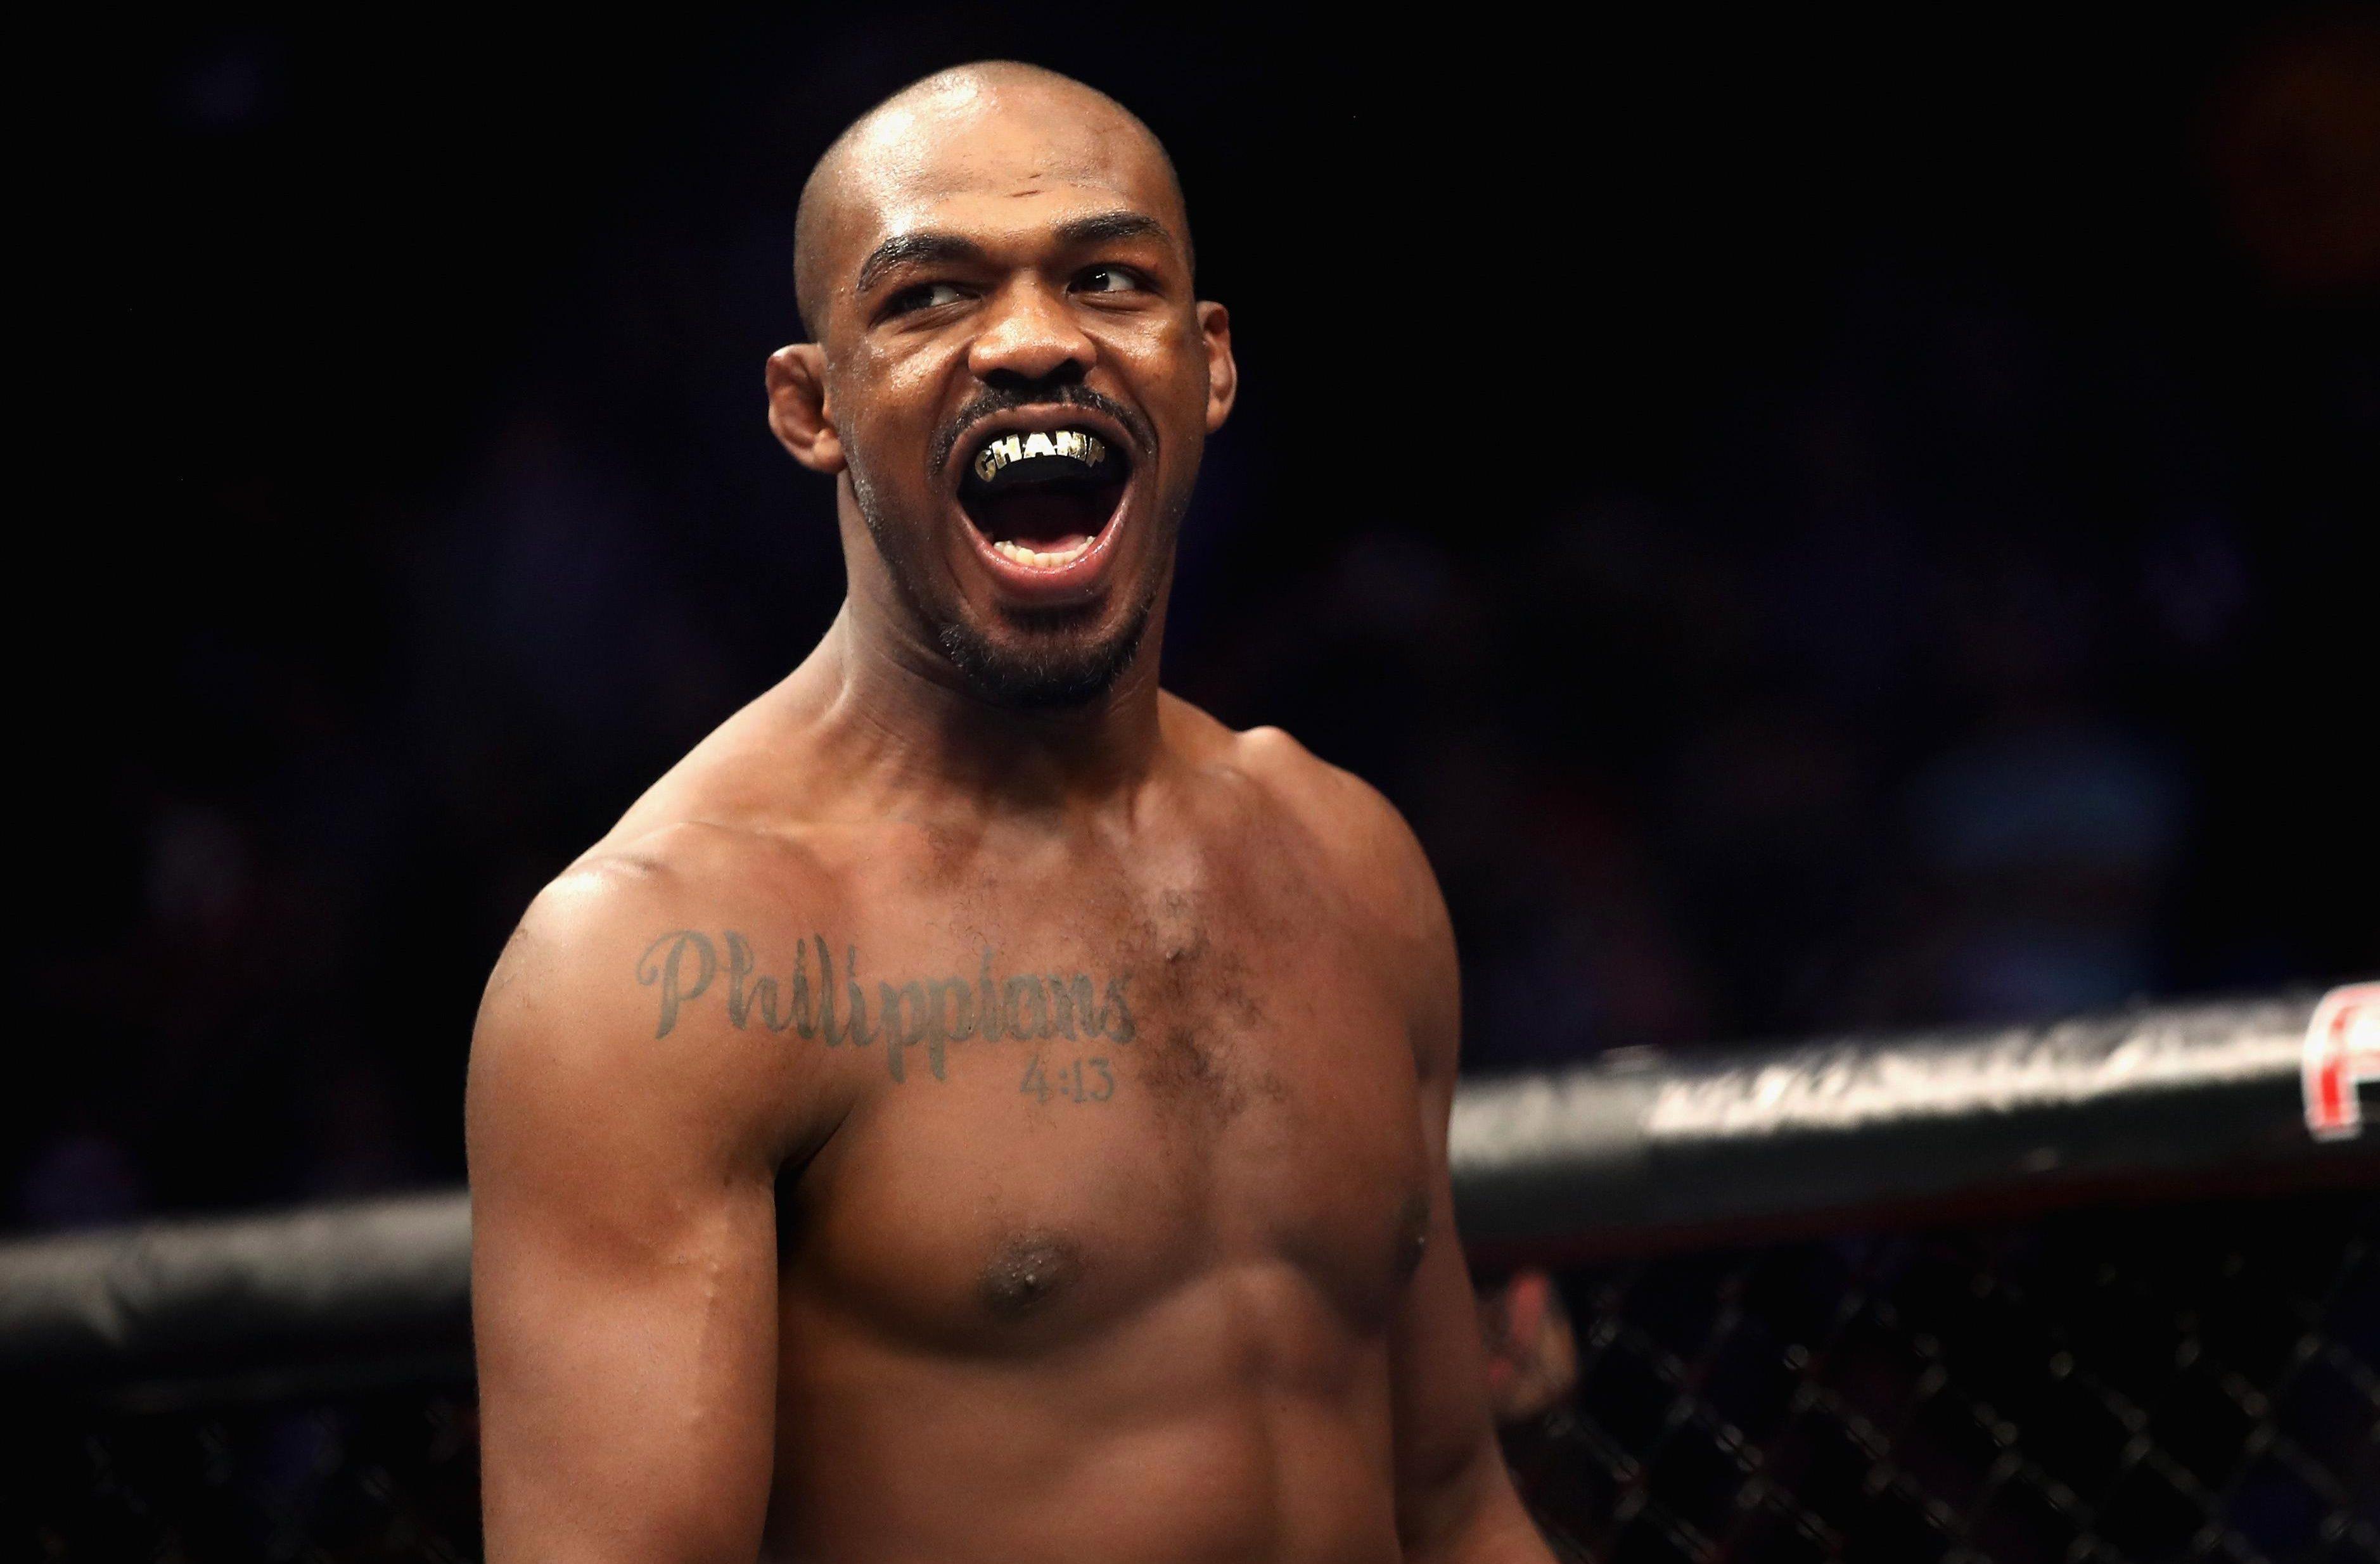 Jones is the current UFC light-heavyweight champion